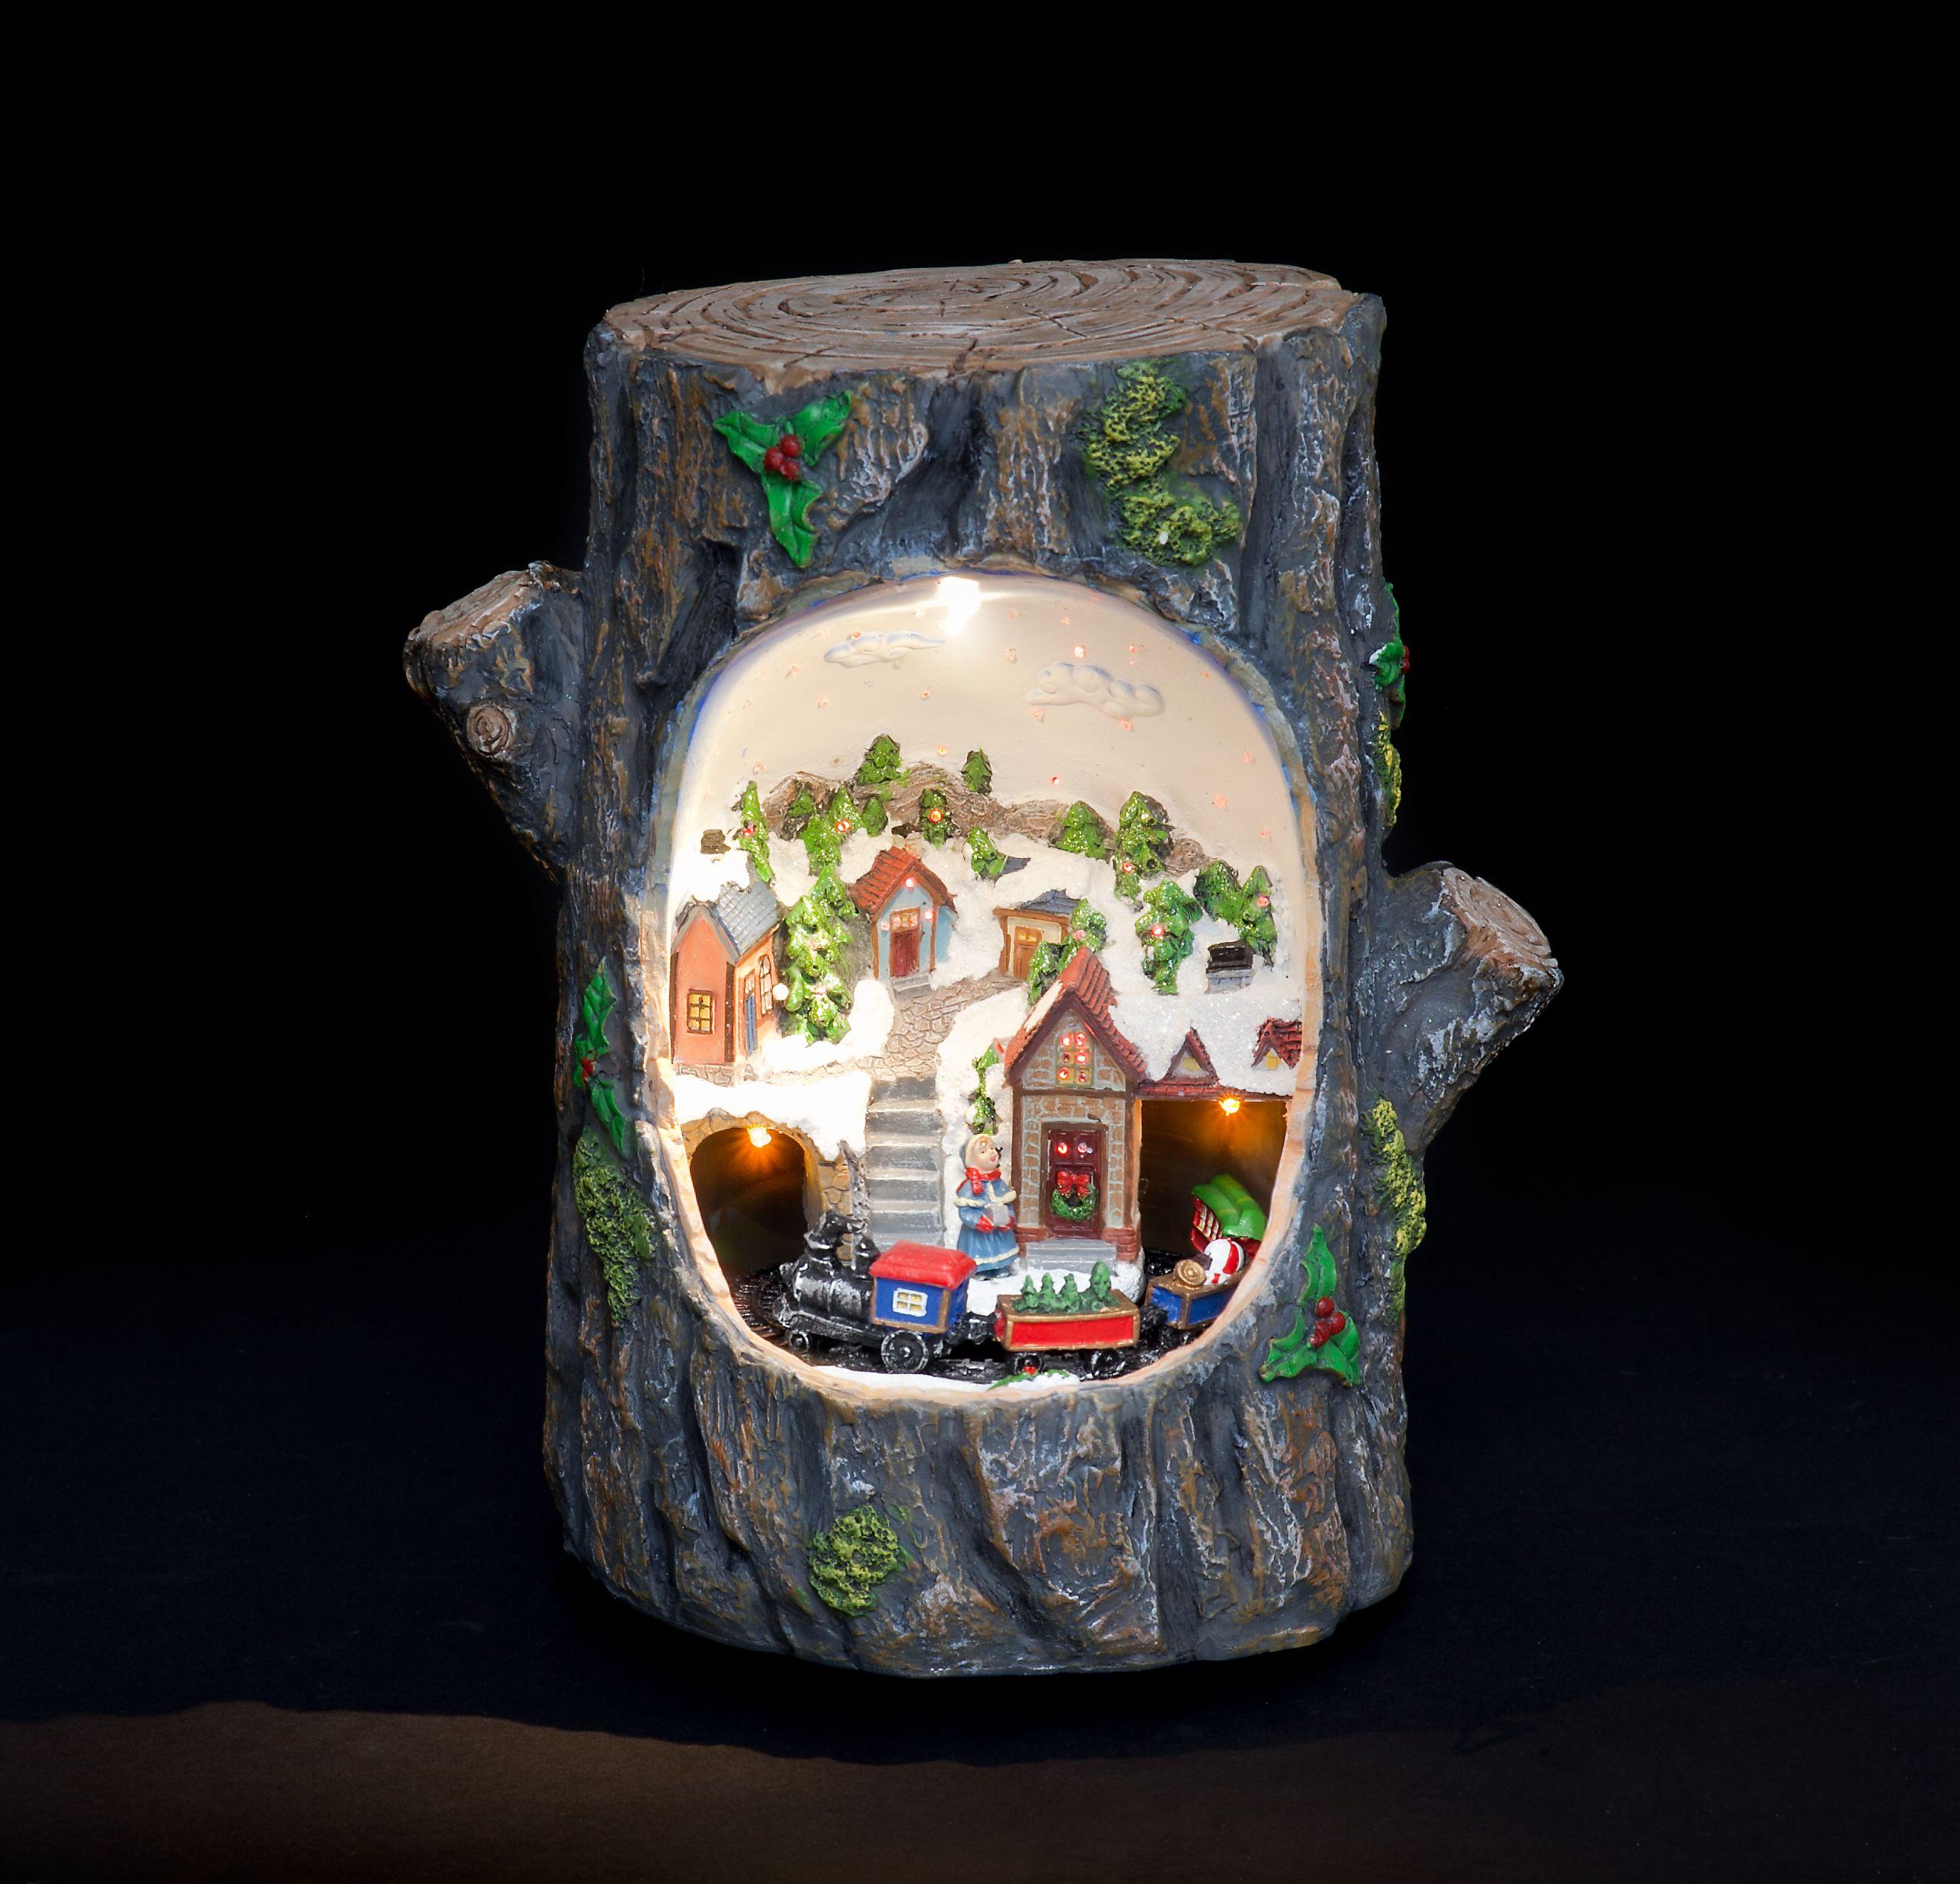 Flying santa fibre optic christmas decoration - Fibre Optic Led Tree Trunk With Train And Village Scene Dual Power Ukchristmasworld